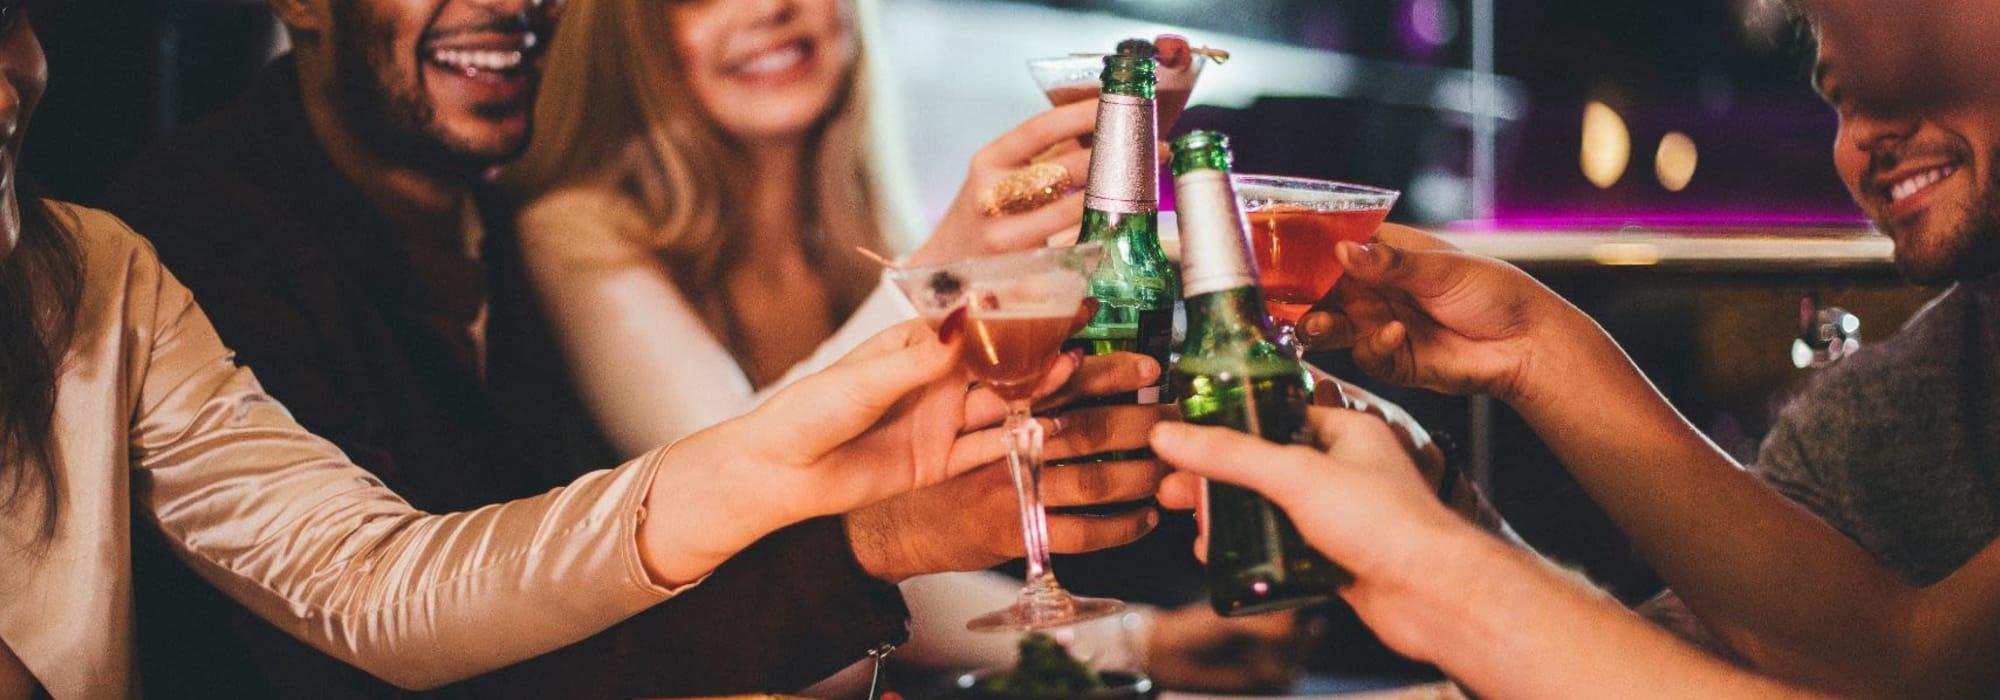 Friends enjoying drink at a local bar in Scottsdale, Arizona near San Artes